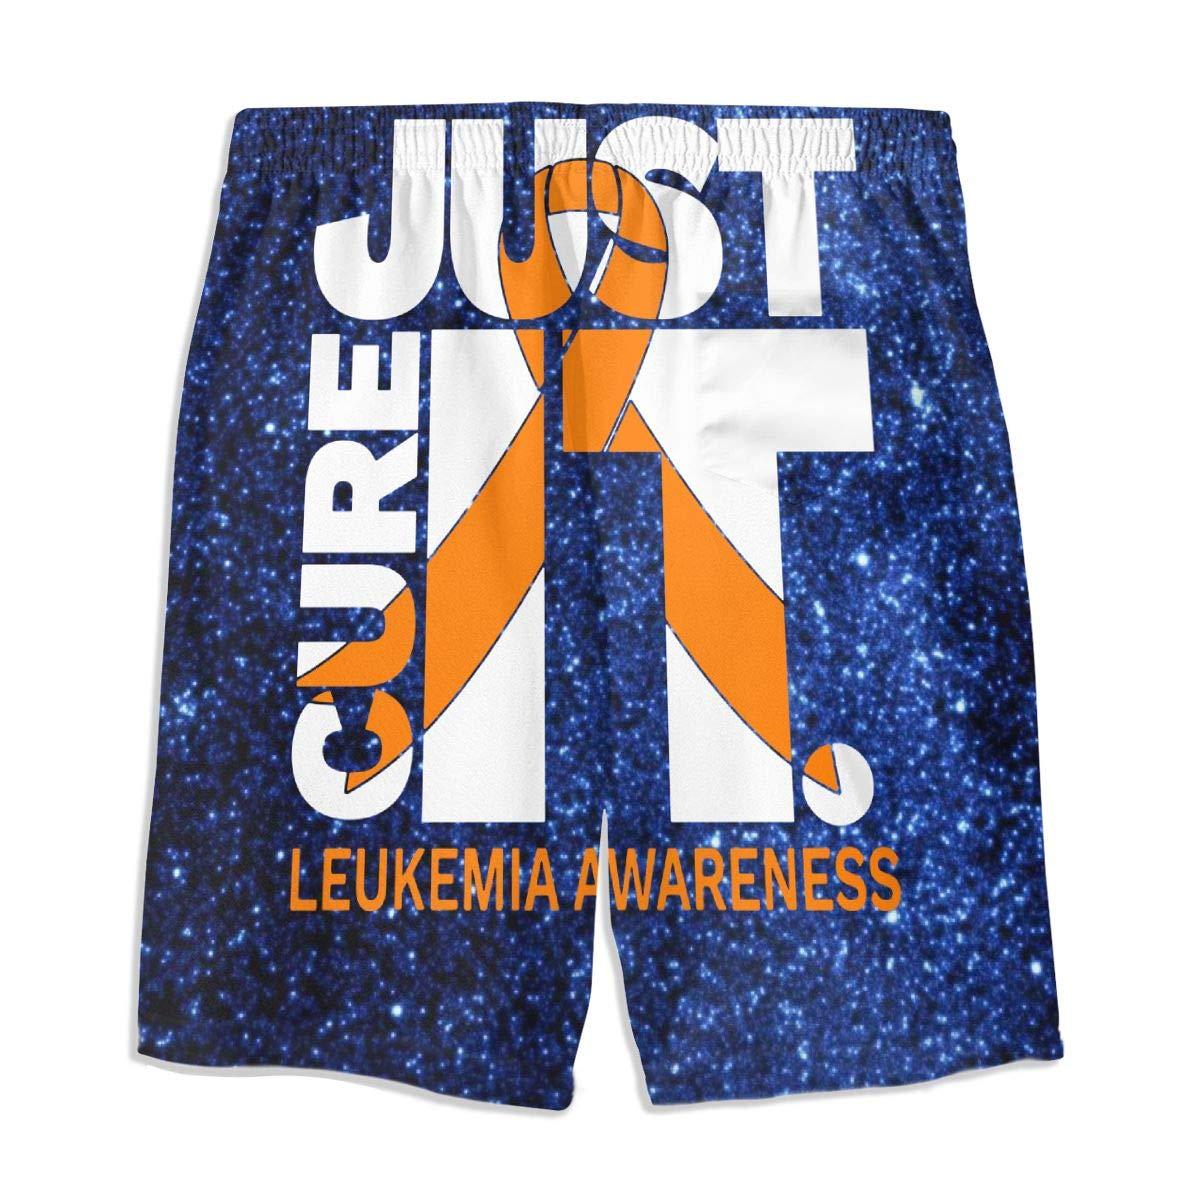 OPQRSTQ-O Just Cure Leukemia Awareness Teen Mens Sports Casual Swimming Shorts Beach Pants